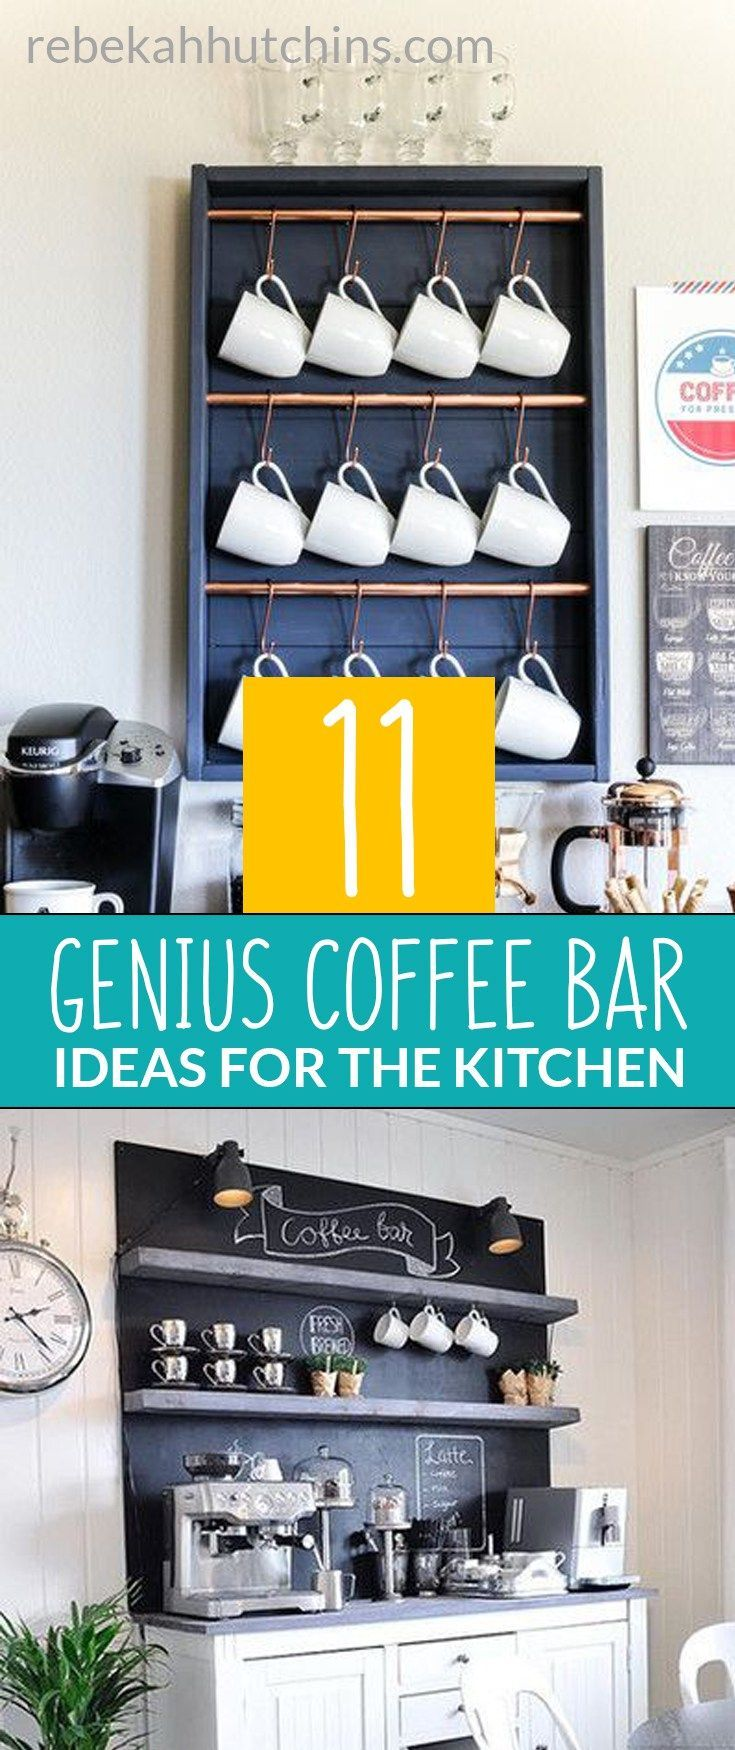 207 best Kitchen & Home images on Pinterest | Decorating kitchen ...